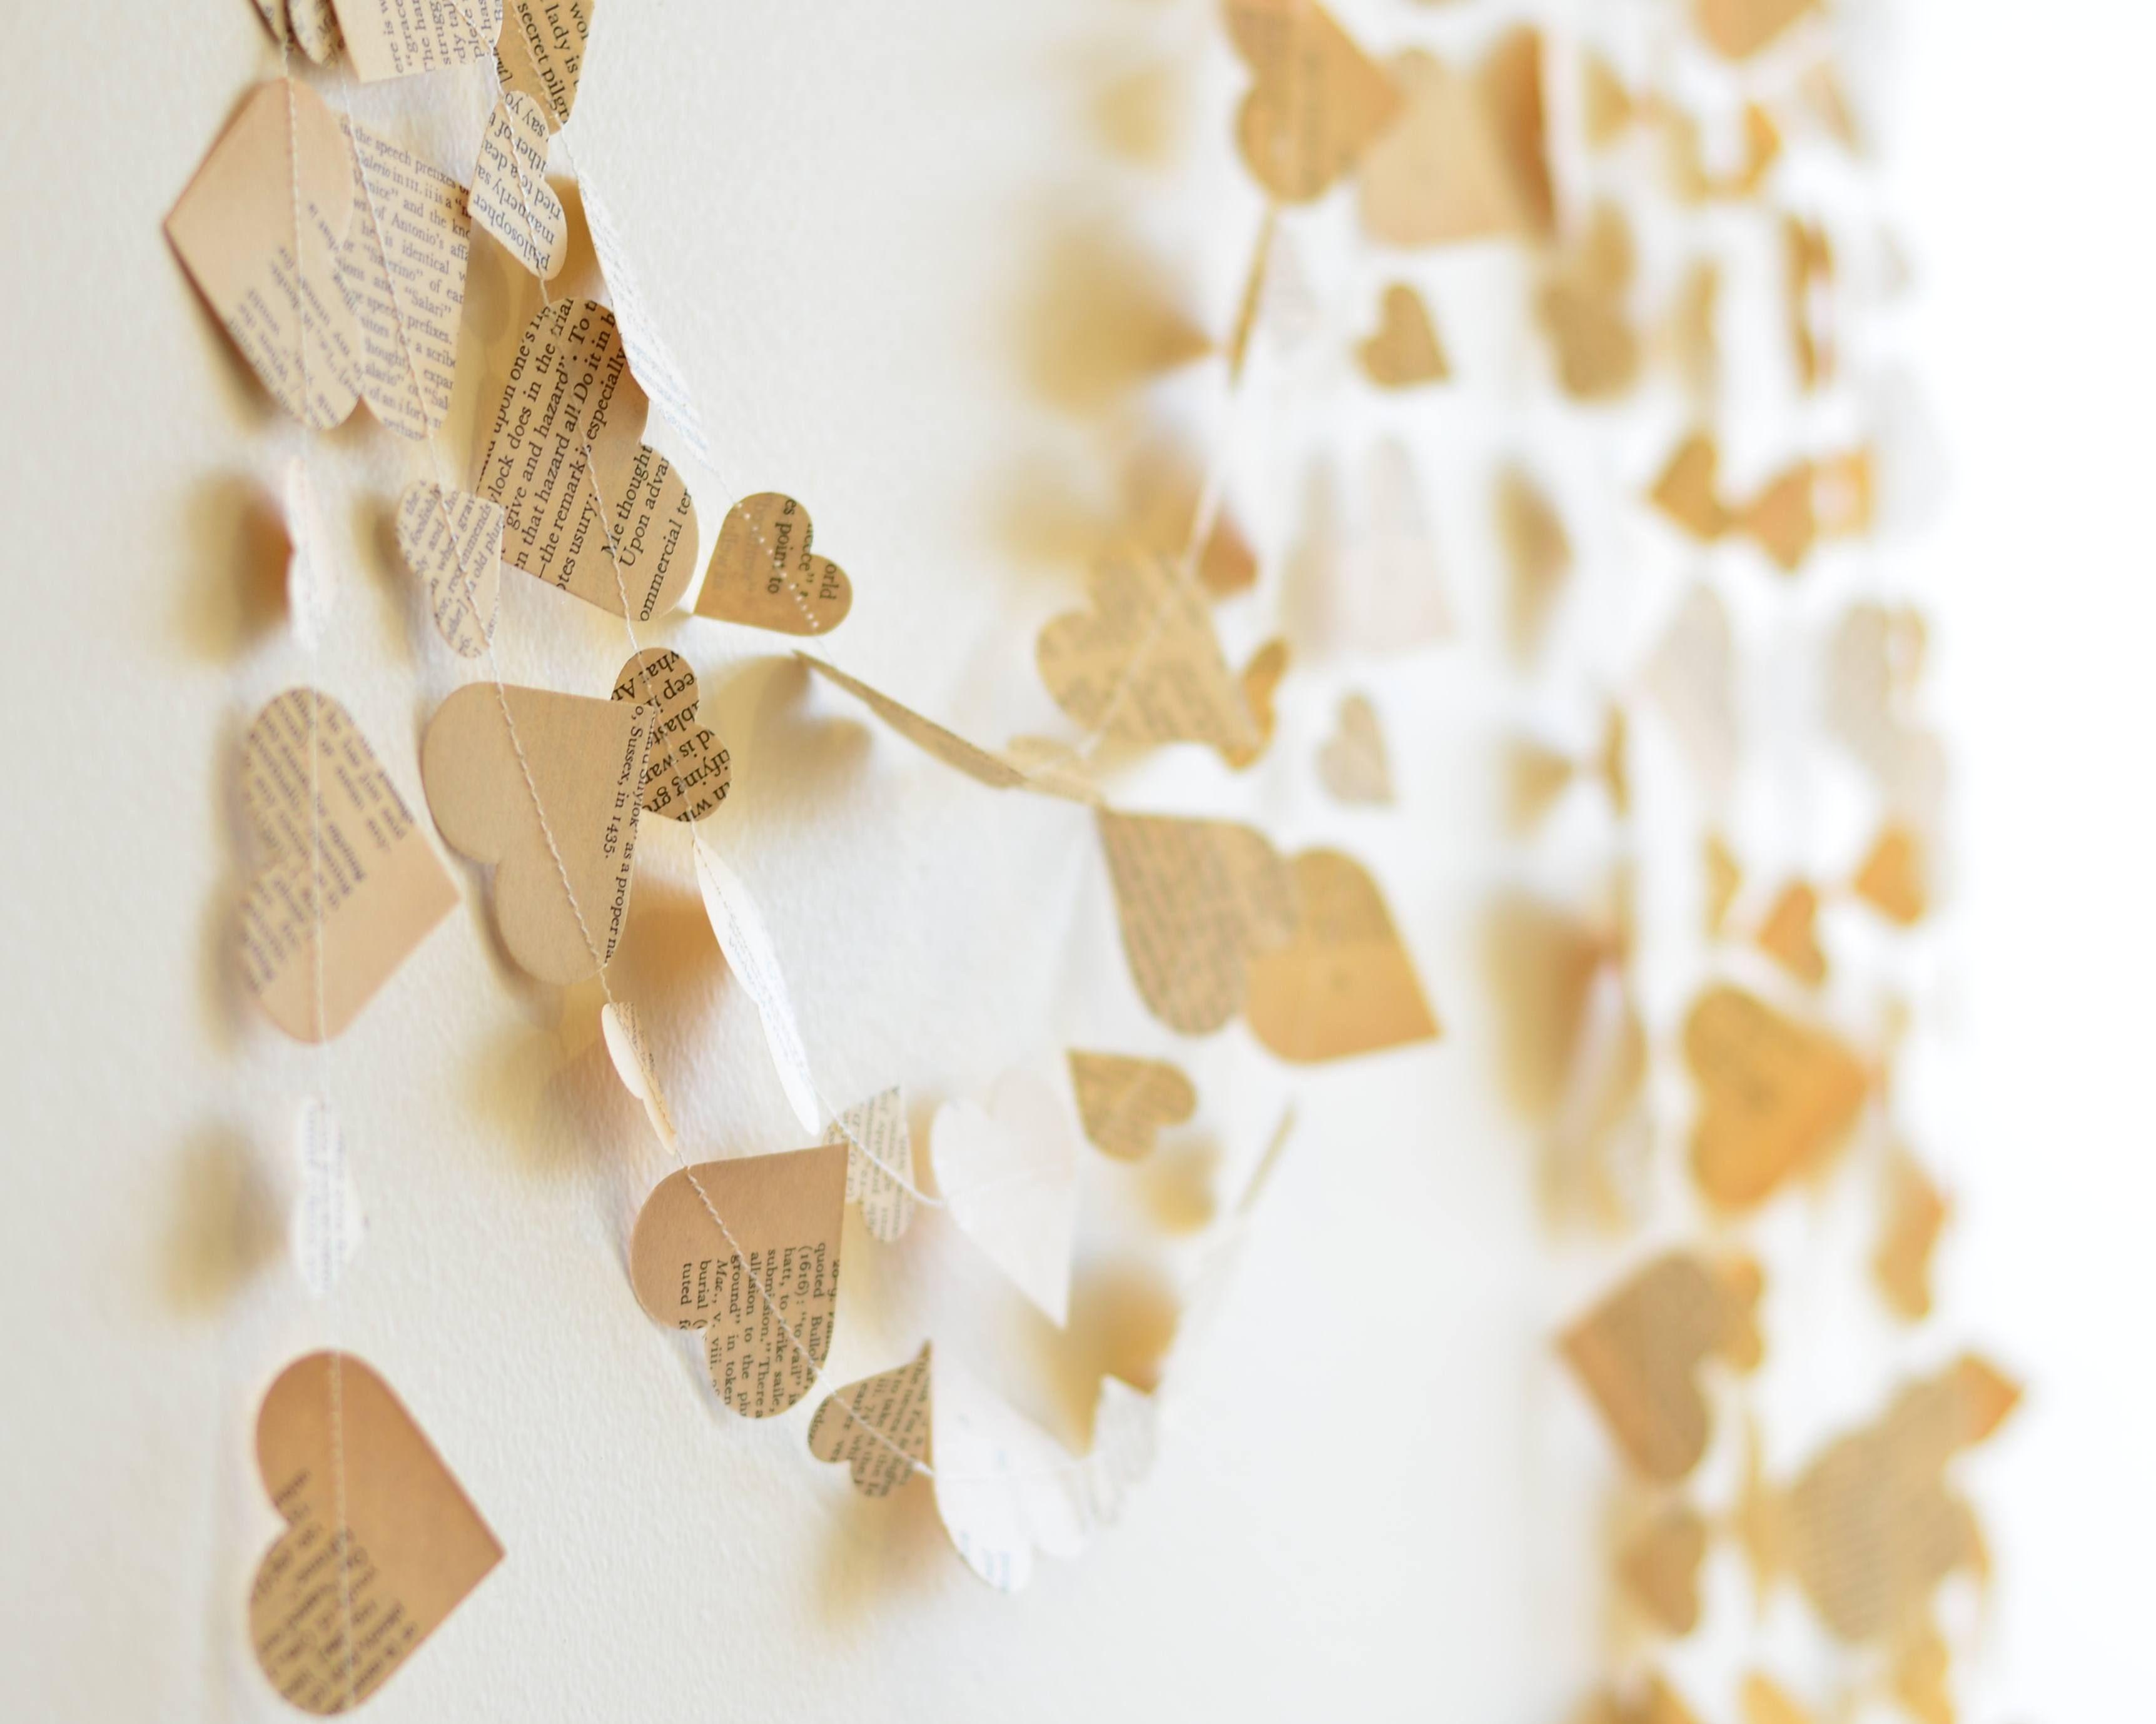 Handmade wedding decorations paper  diy wedding paper decorations  Google Search  wedding ideas